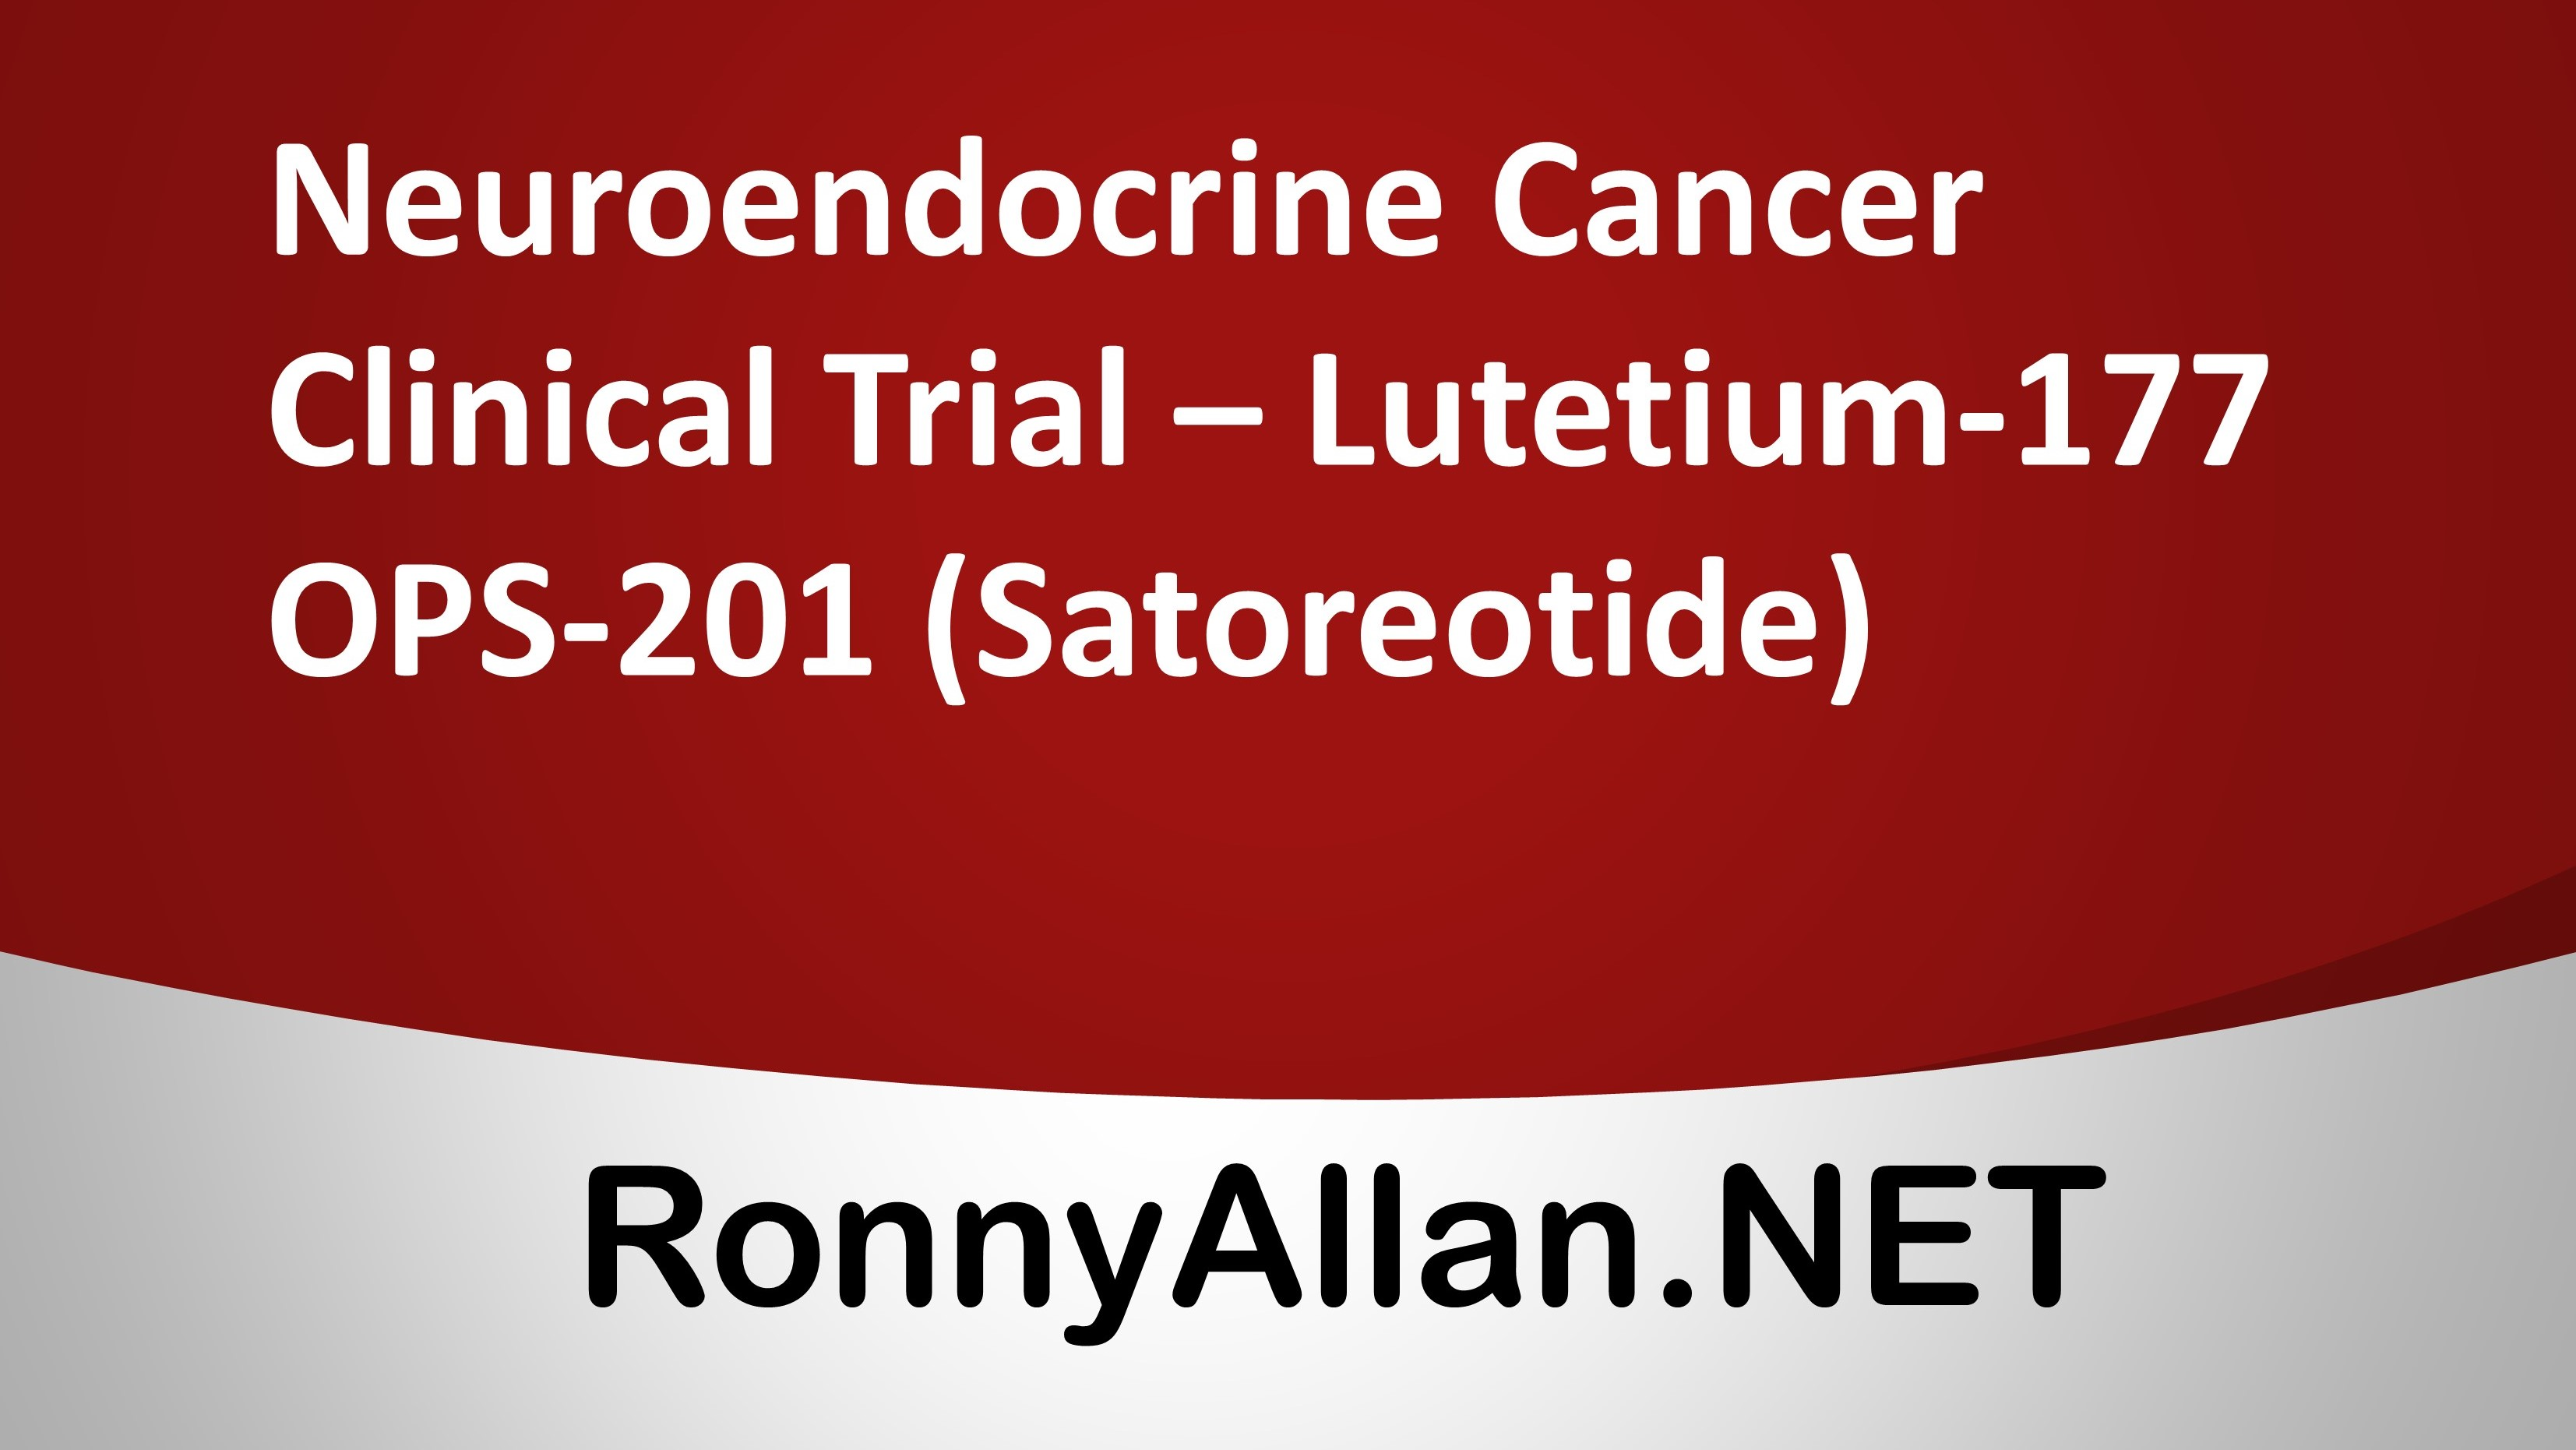 Neuroendocrine Cancer Clinical Trial - Lutetium-177 OPS-201